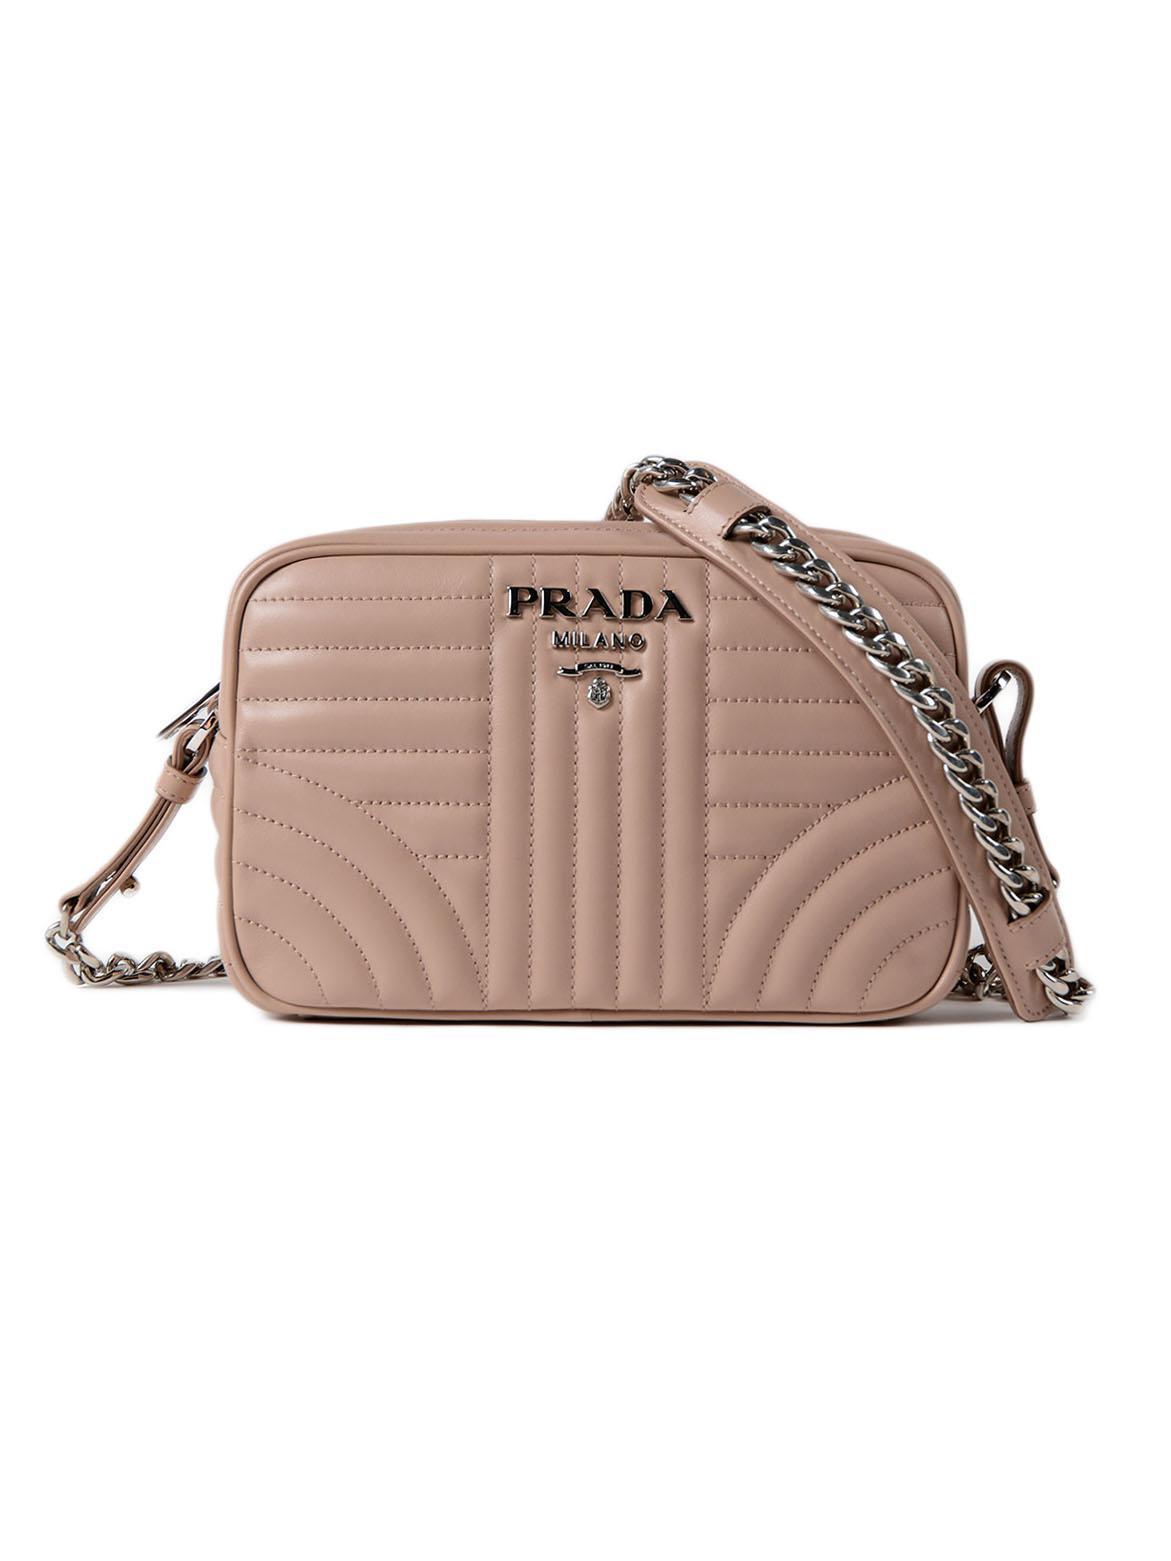 81acd7e98994 Prada Soft Calf Impunture Crossbody - Lyst